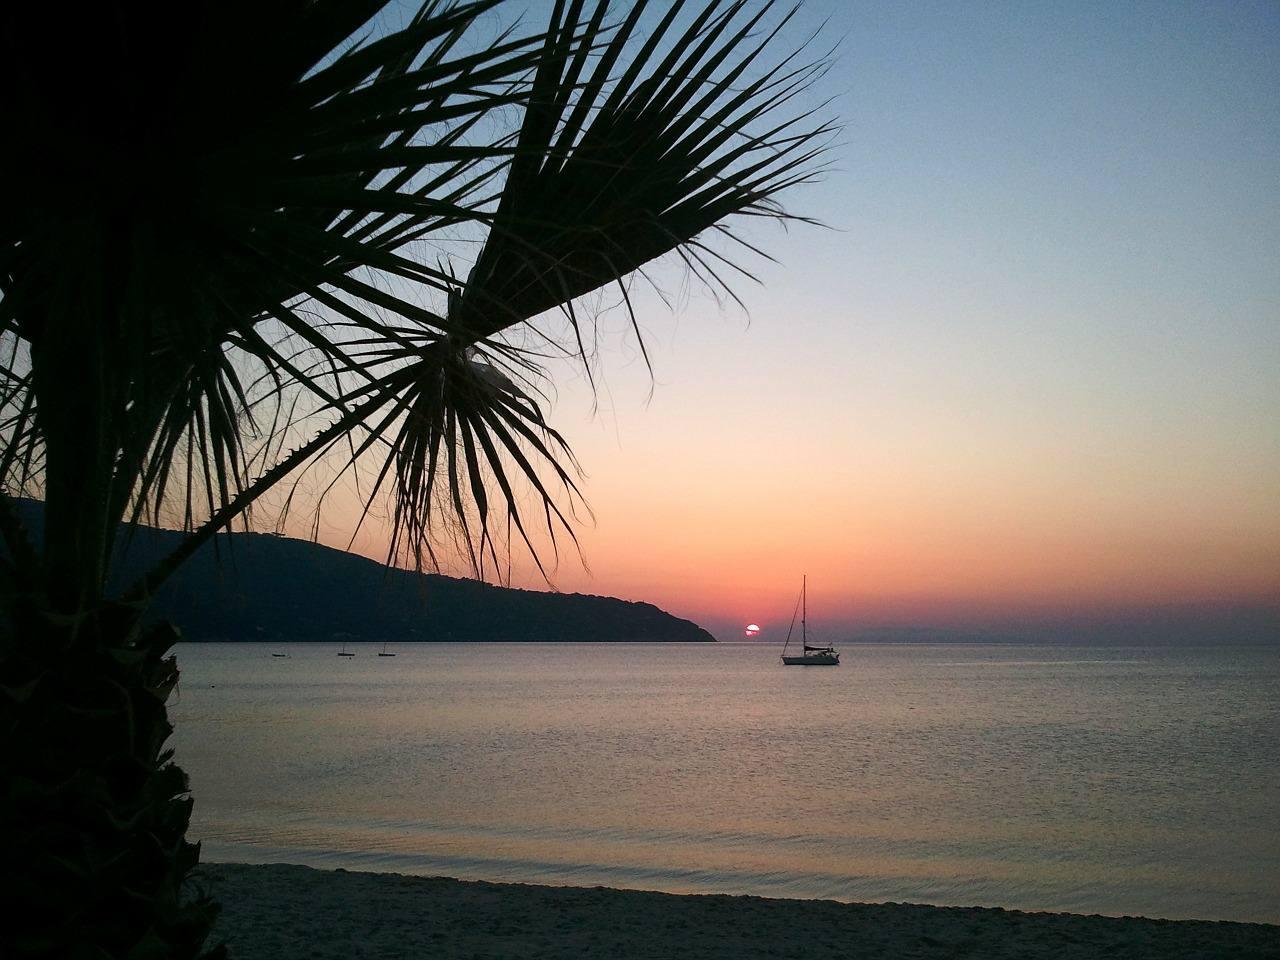 Best beaches in Tuscany - Beach in Elba Island